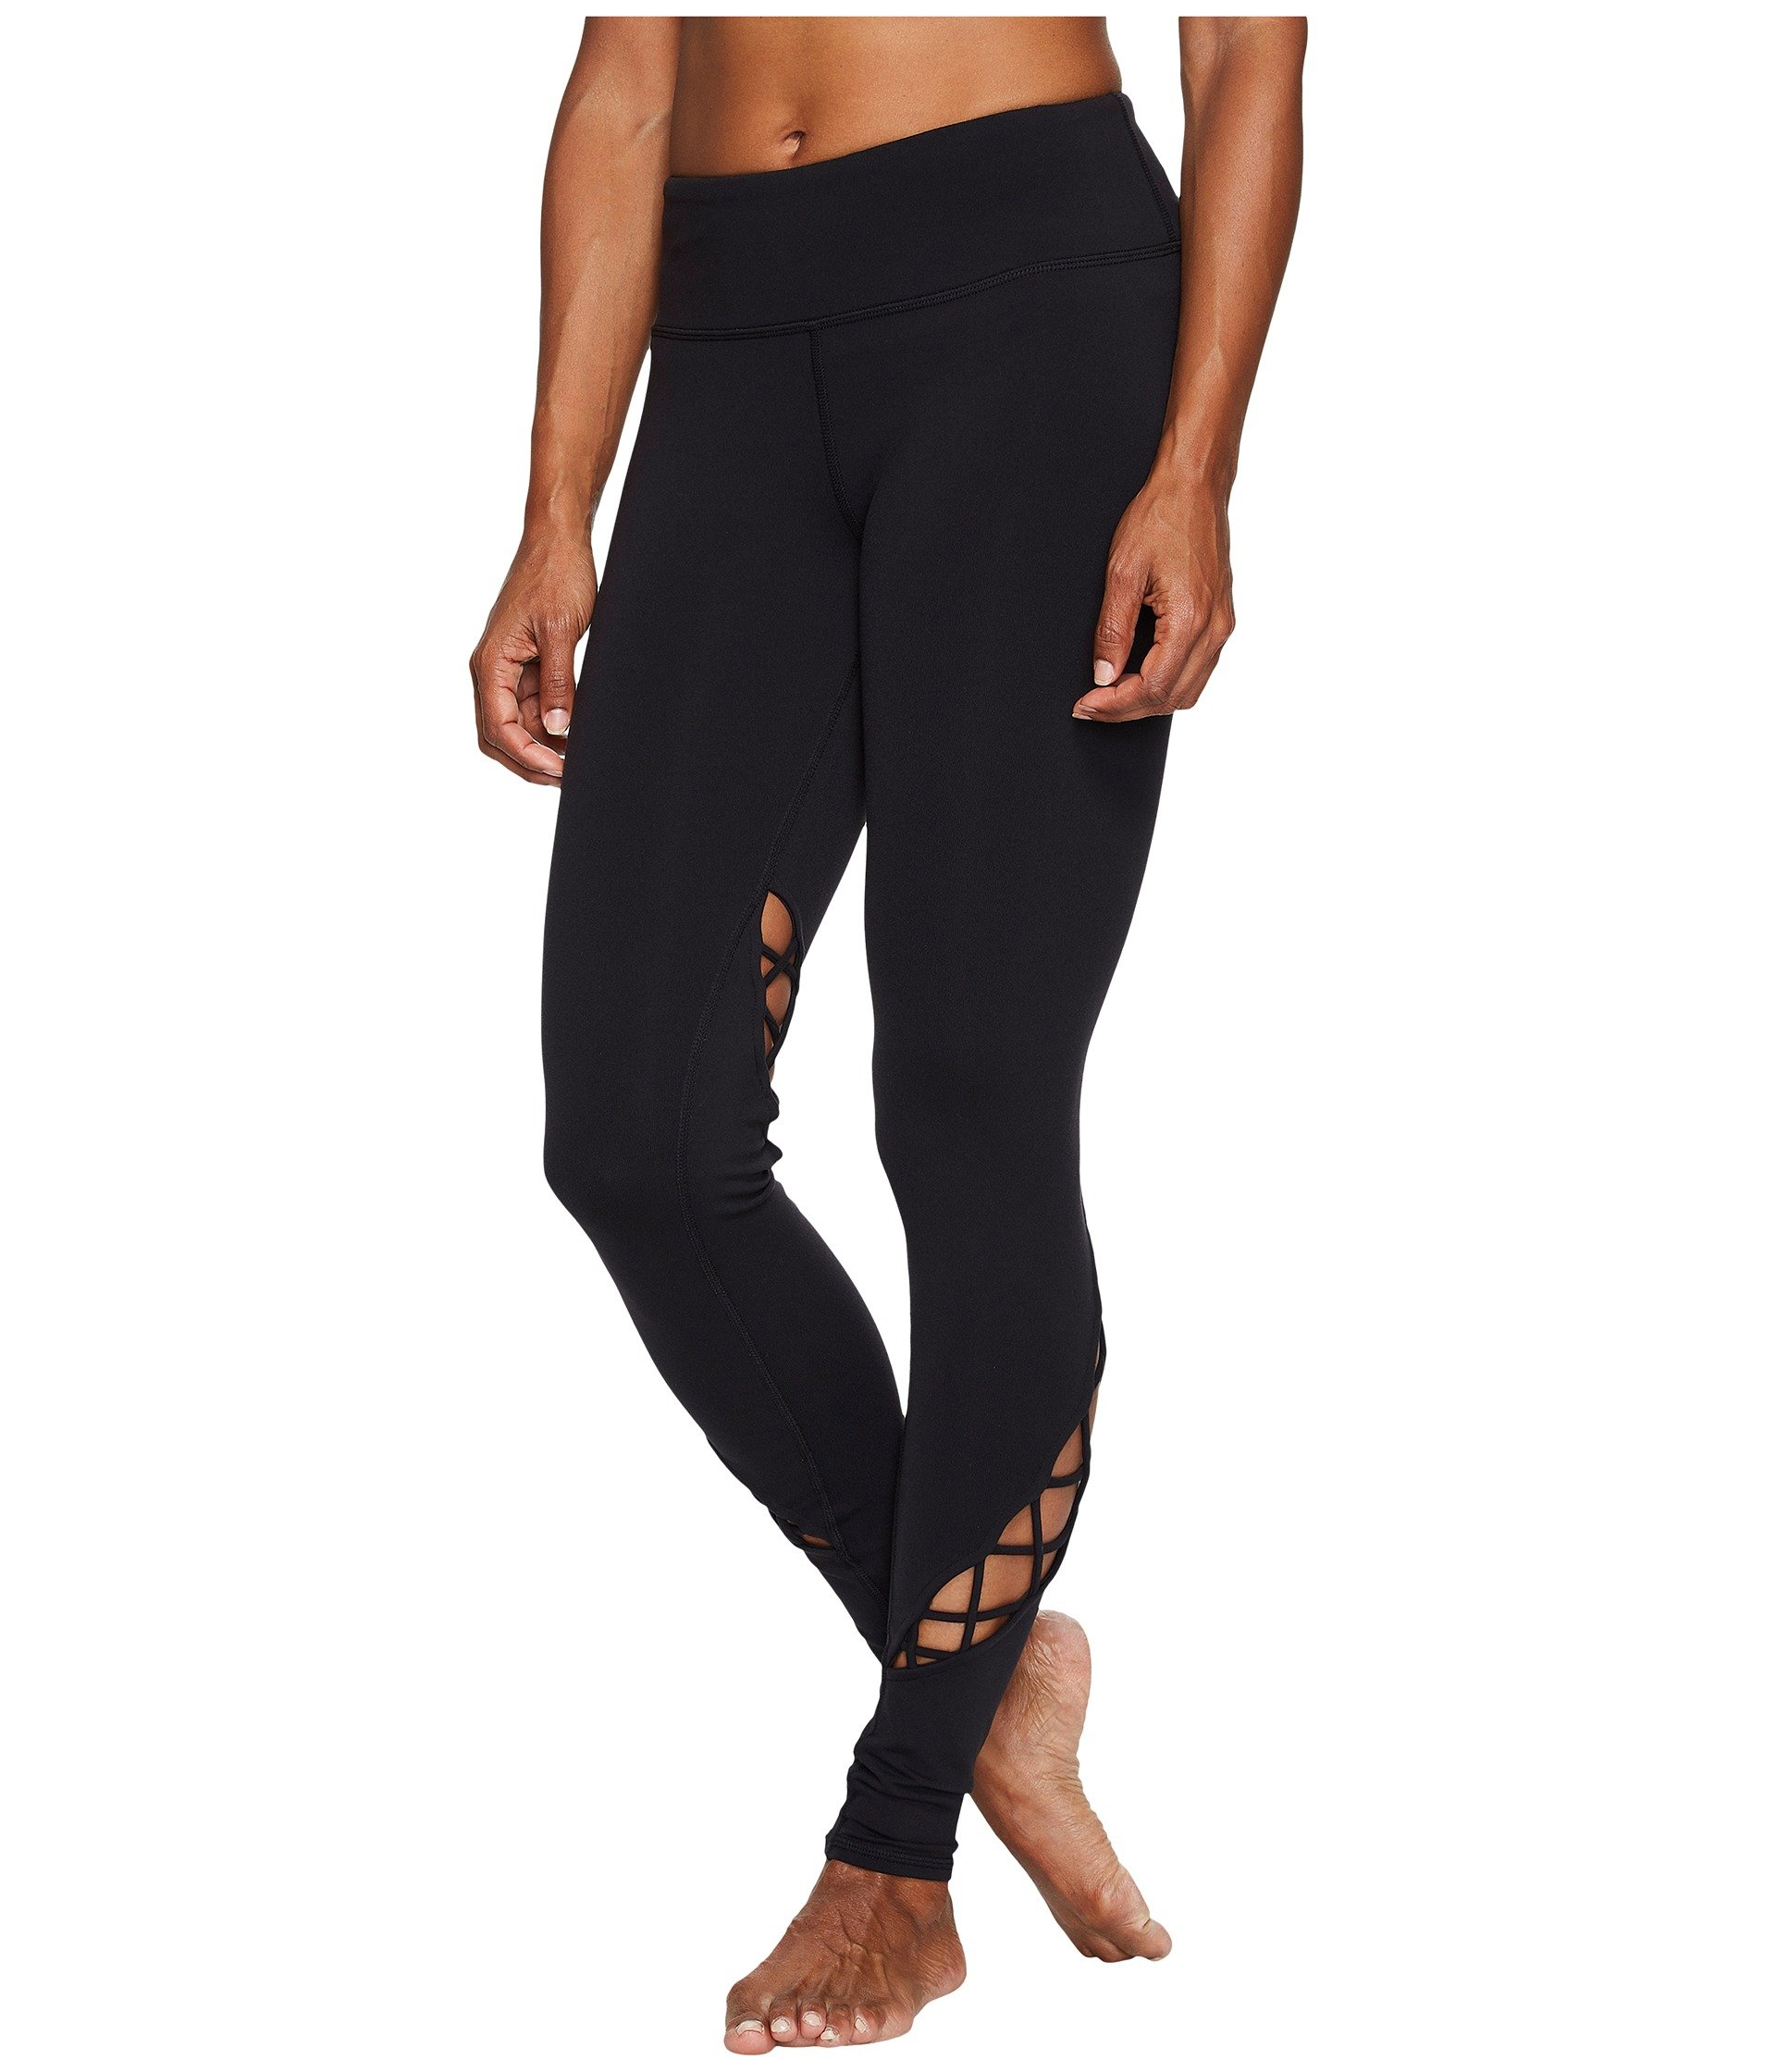 Alo Yoga Women's Entwine Legging, Black, XX-Small